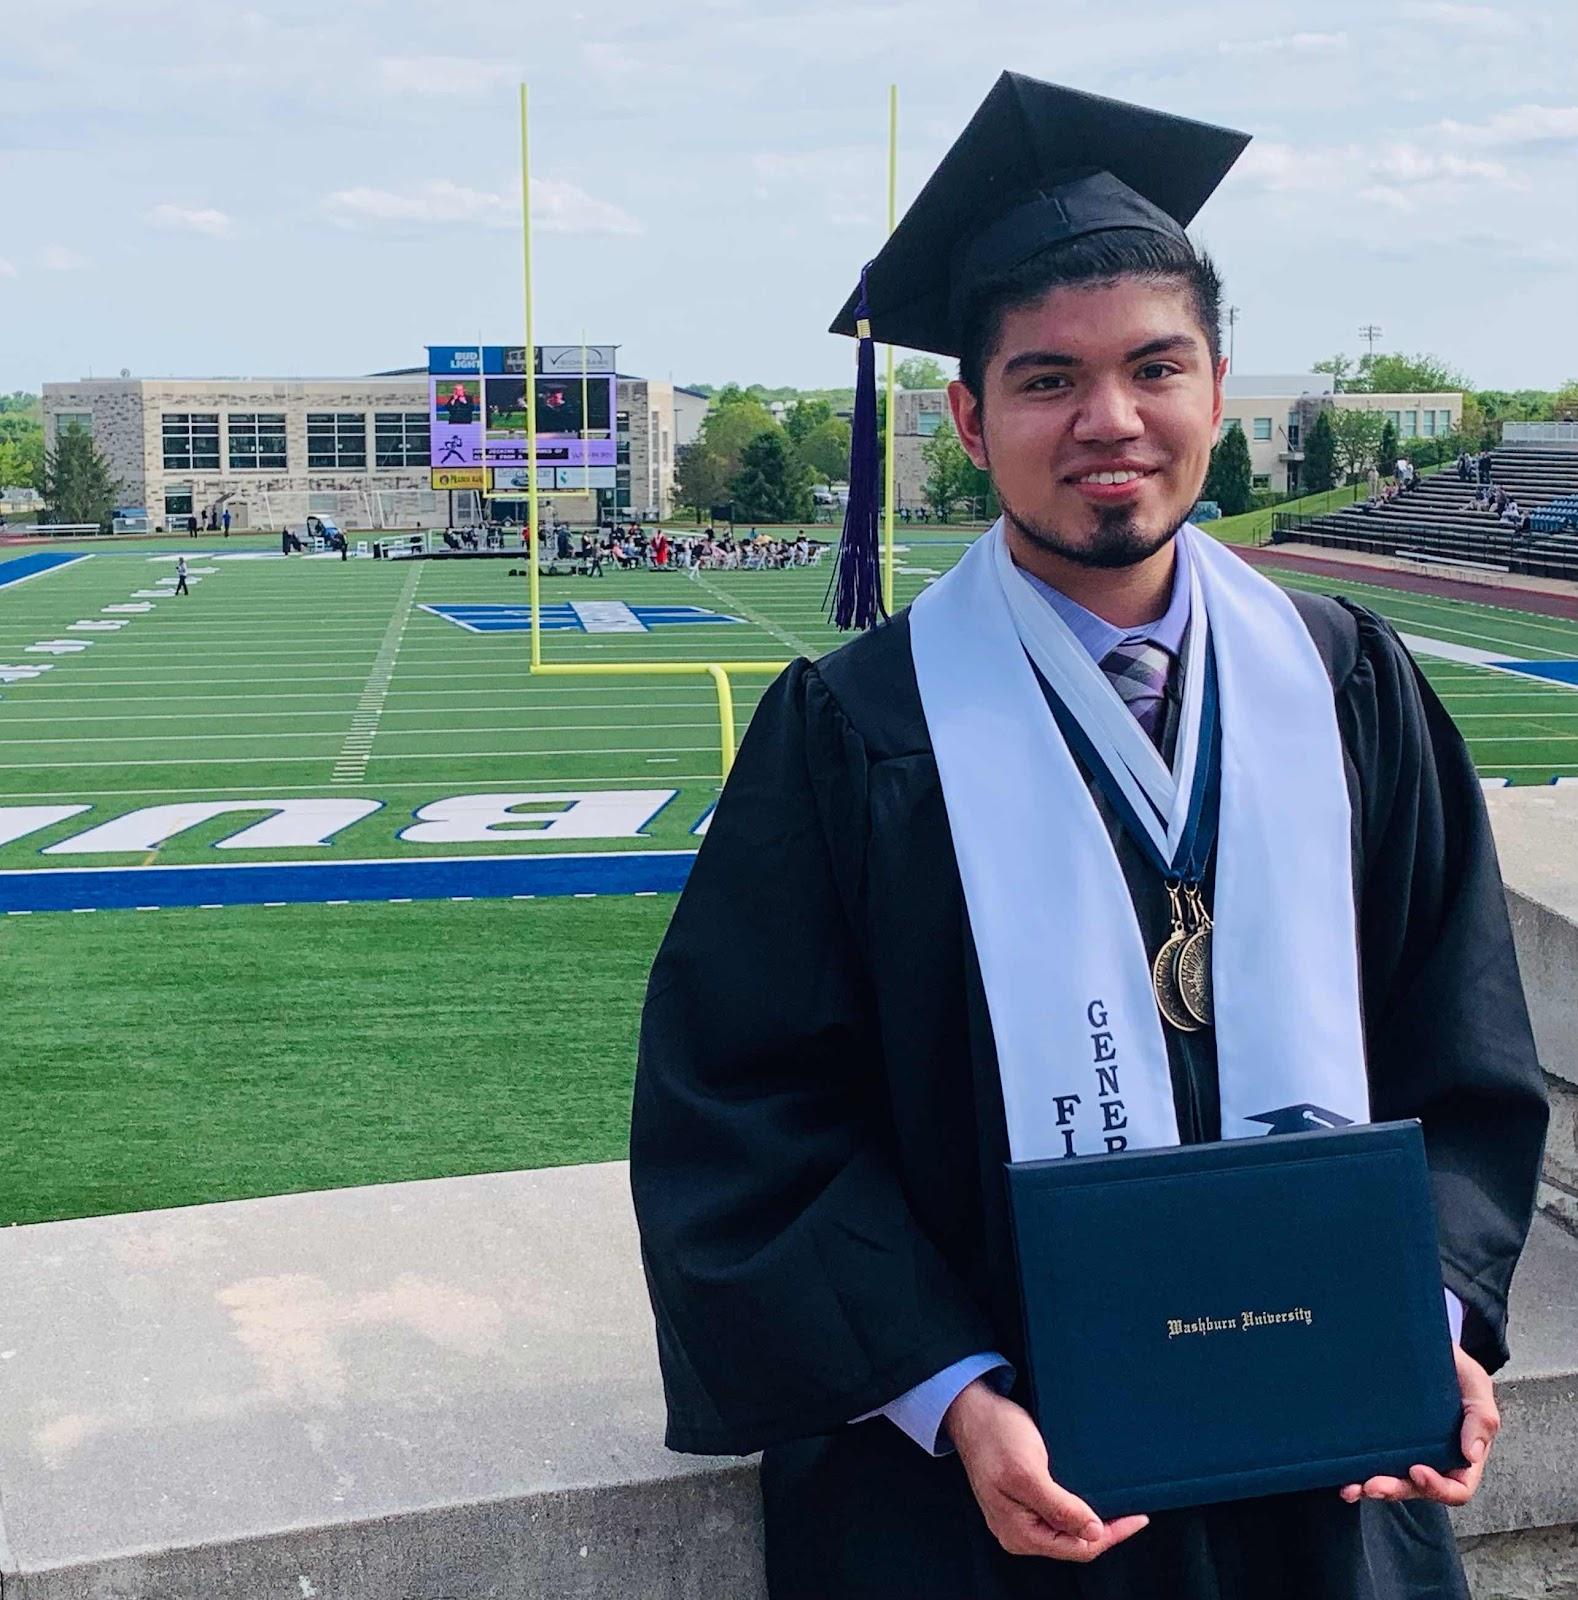 Post Graduation Picture of Ben